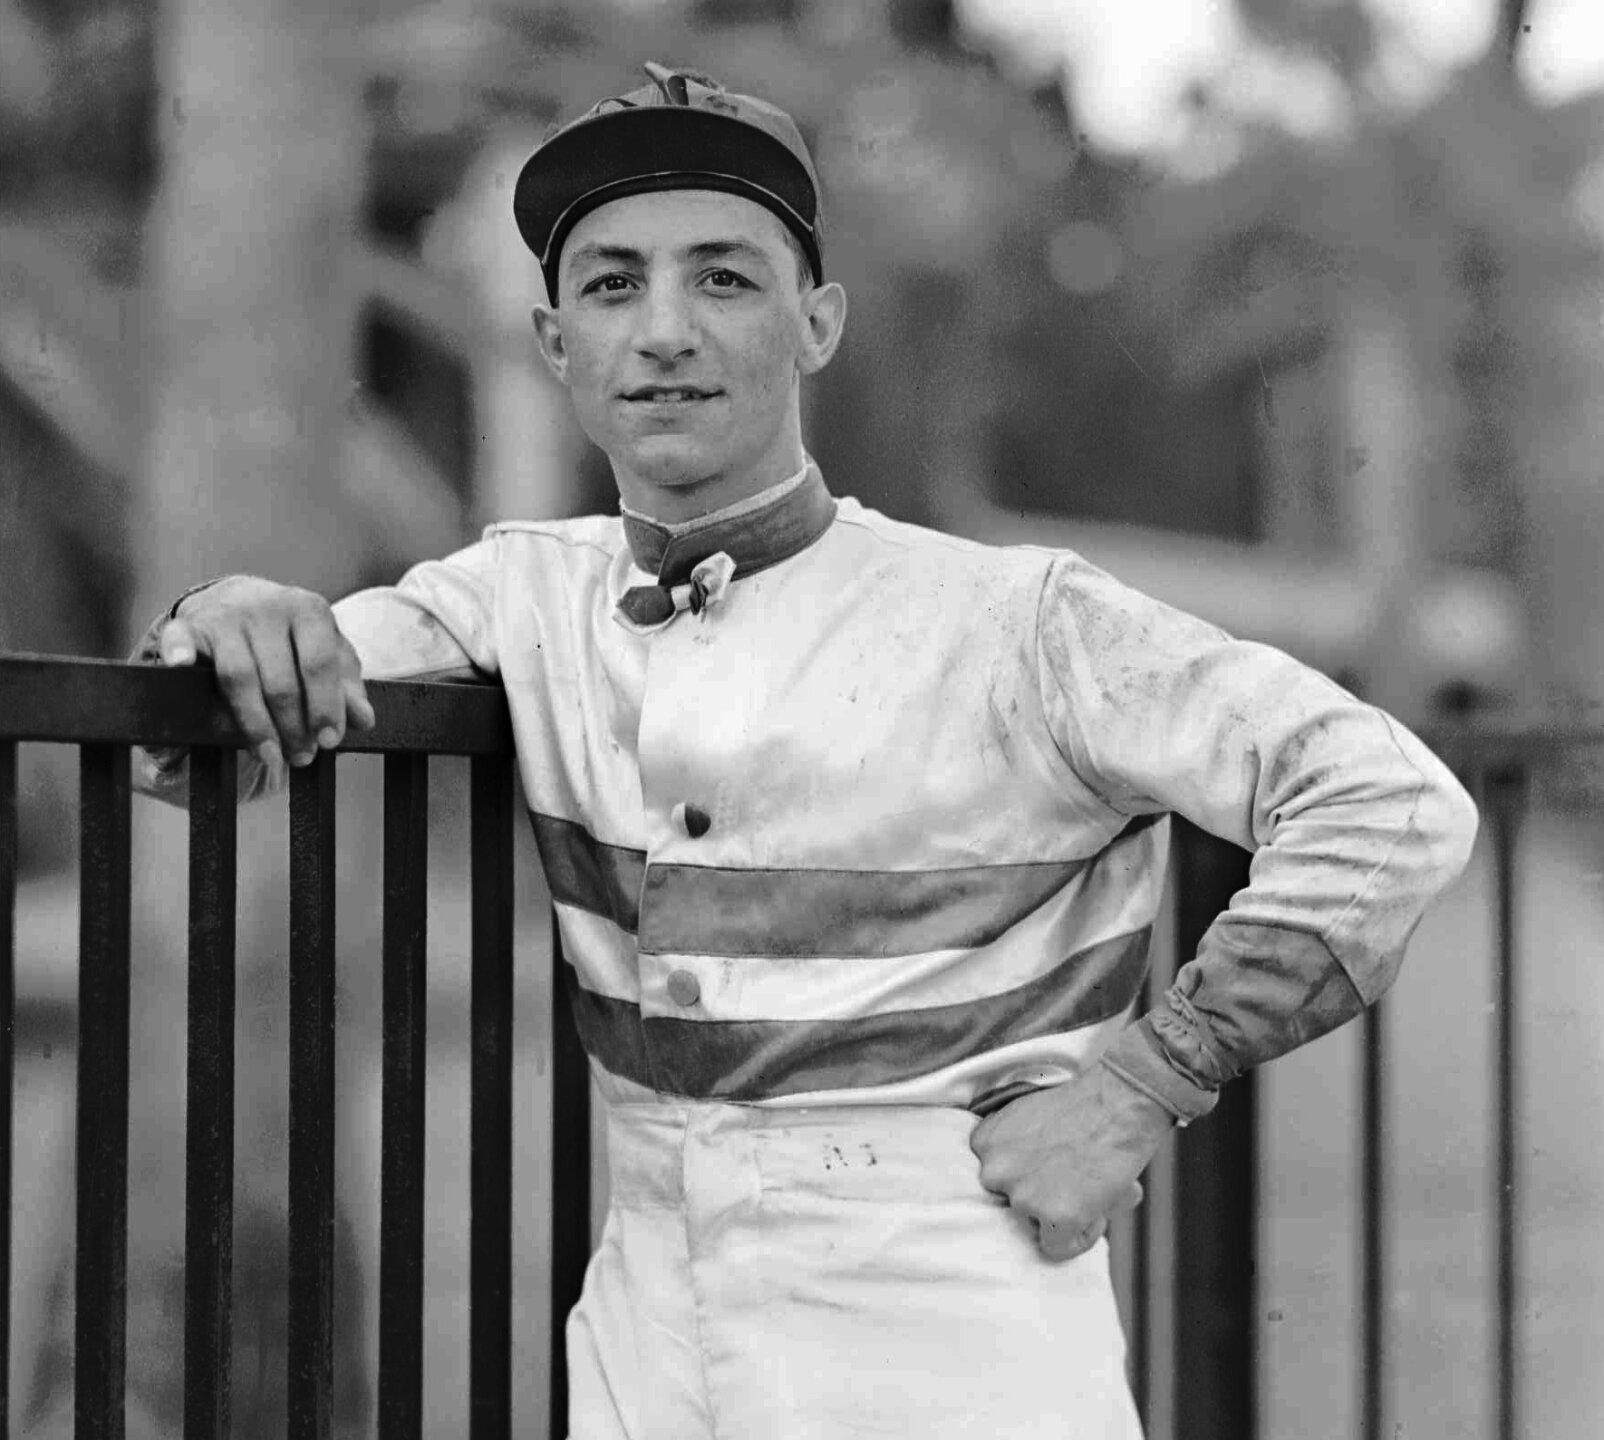 JOCKEY EDDIE ARCARO RACING SILKS MARCH 4, 1942 HIALEAH PARK